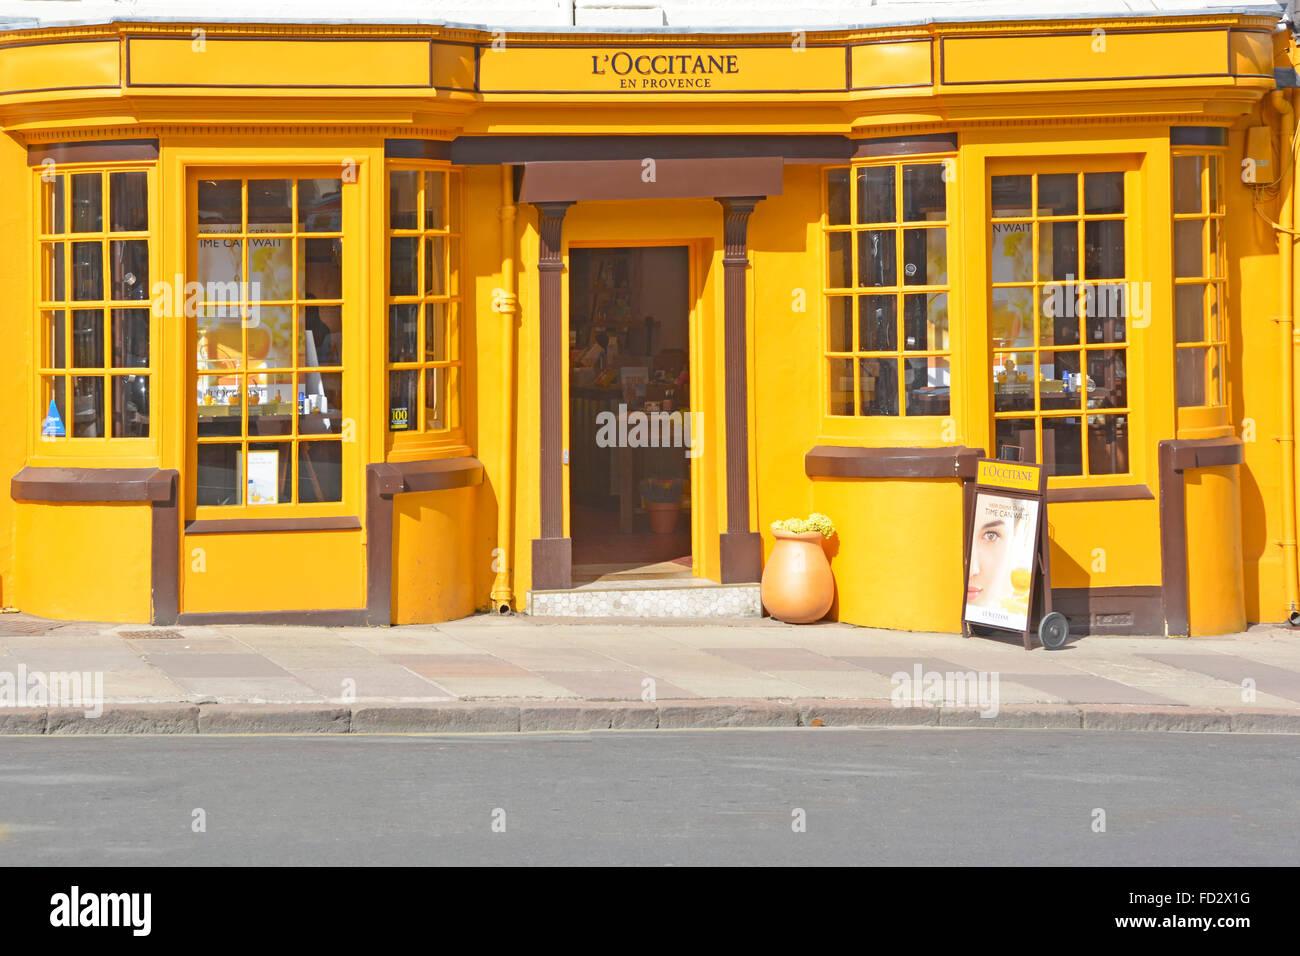 L ' Occitane En Provence Shop vertreibt Kosmetik & Beauty-Produkte (L'Occitane feiert & bewahrt Stockbild